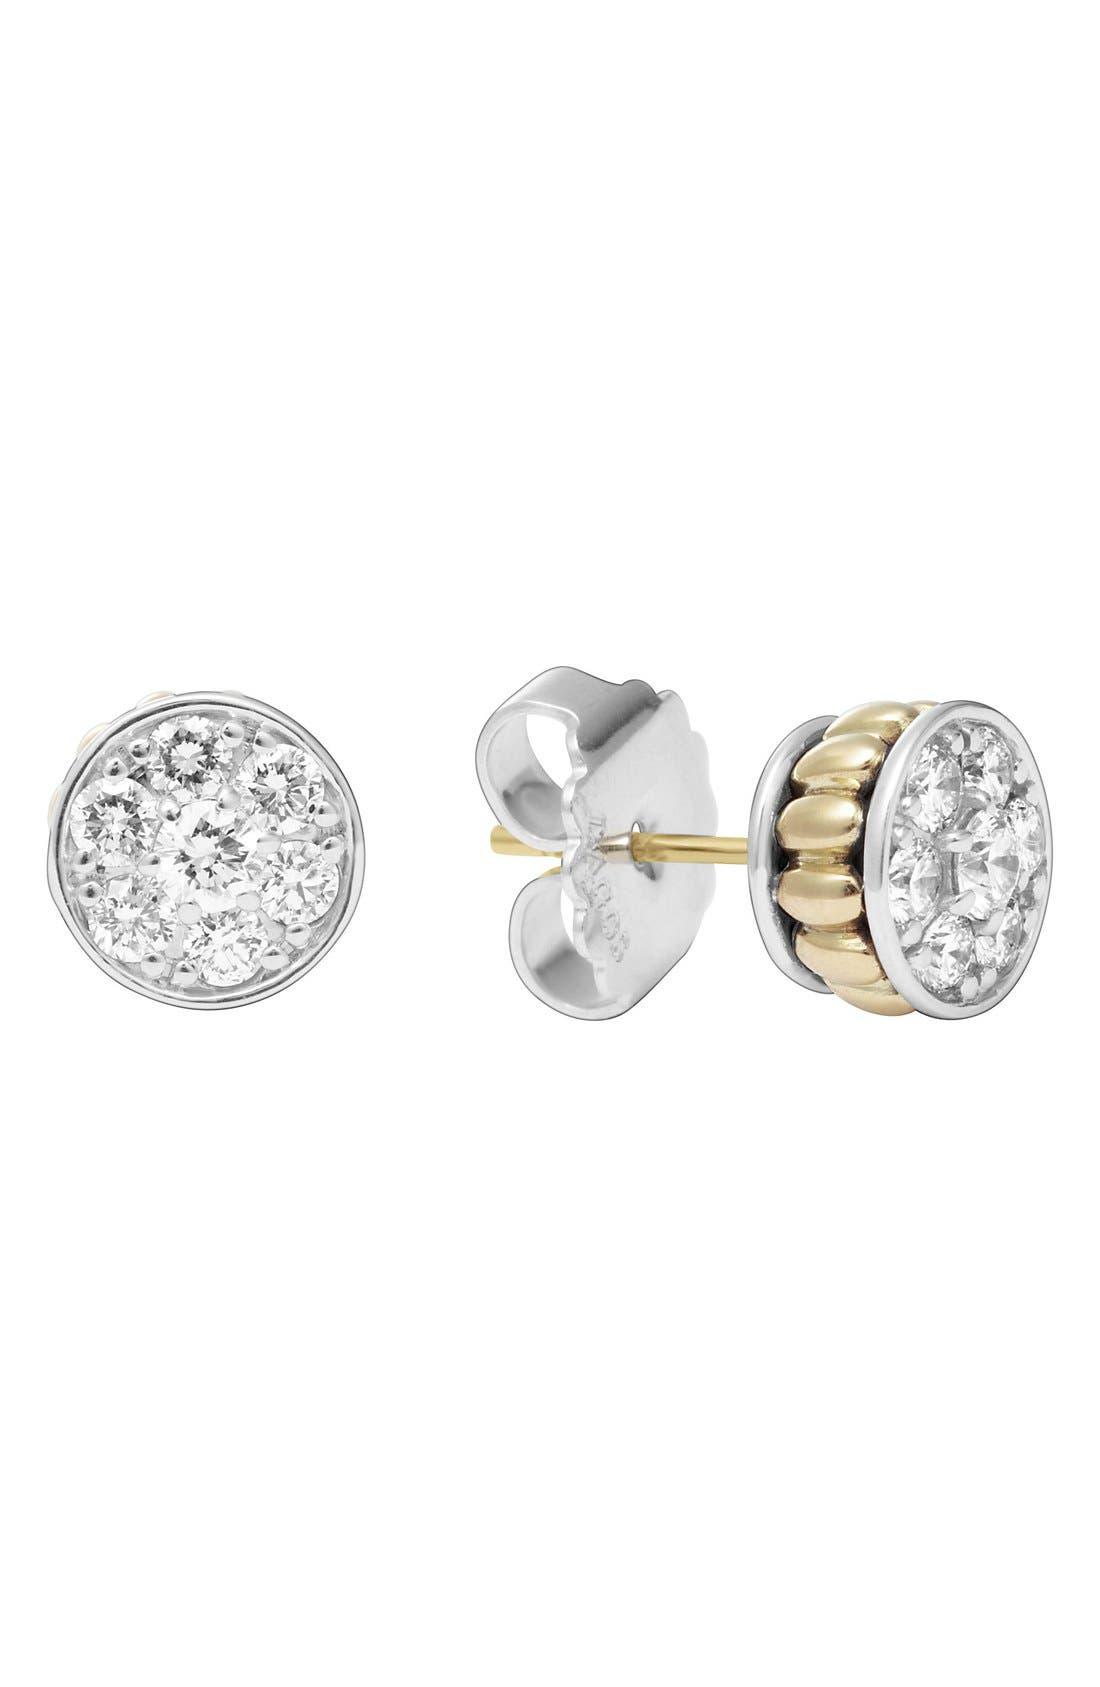 Diamond & Caviar Stud Earrings,                             Main thumbnail 1, color,                             040